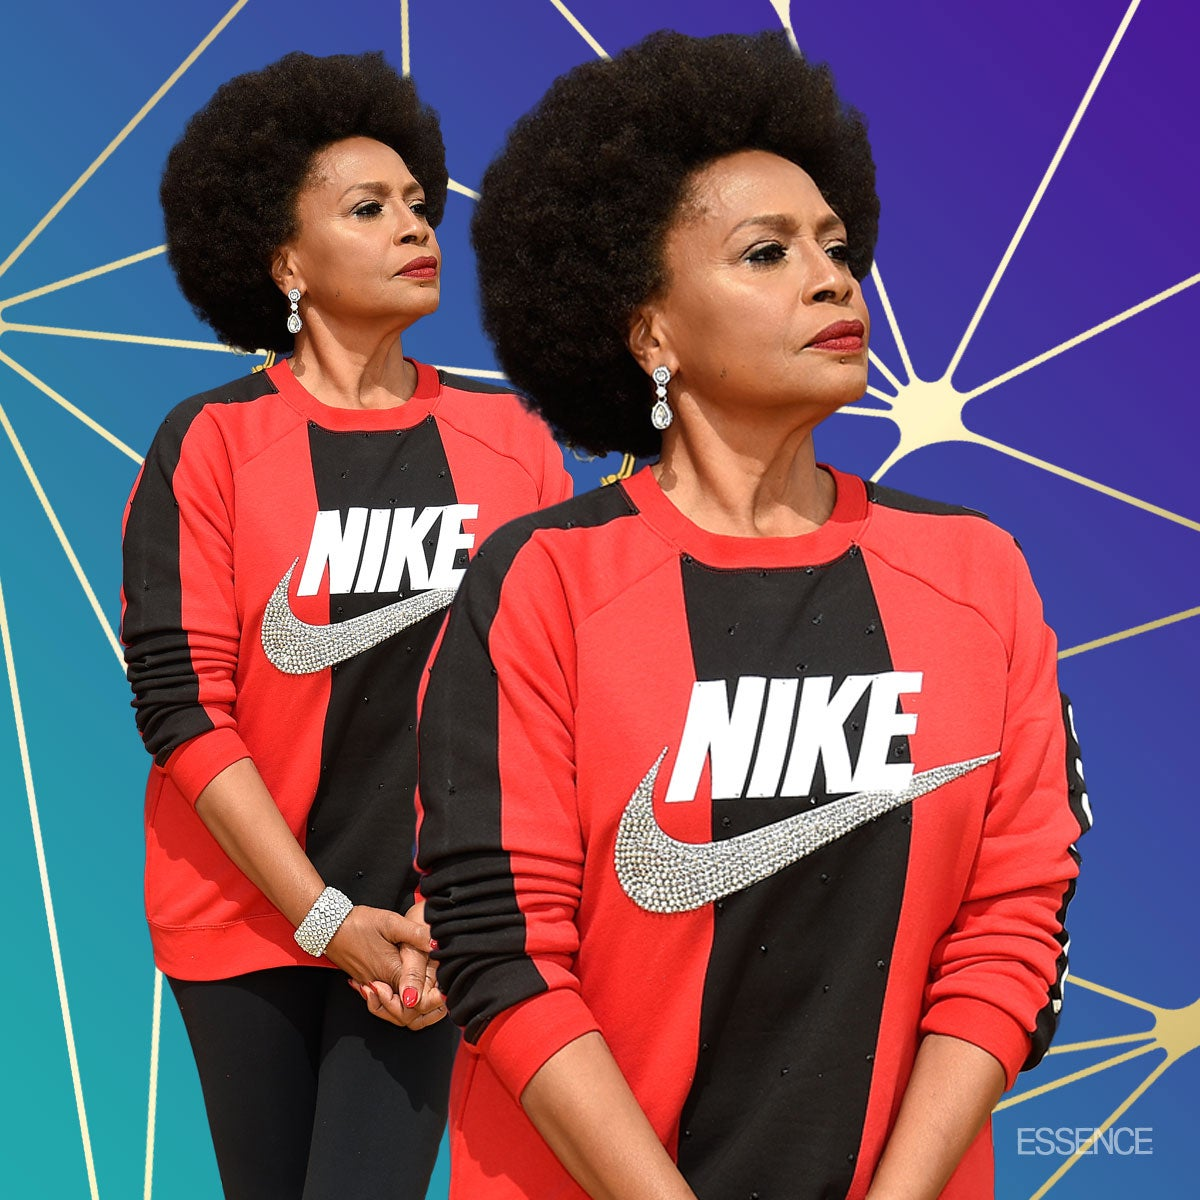 d3883fd091166 Jenifer Lewis Wears Nike On Emmys Red Carpet To Support Colin Kaepernick